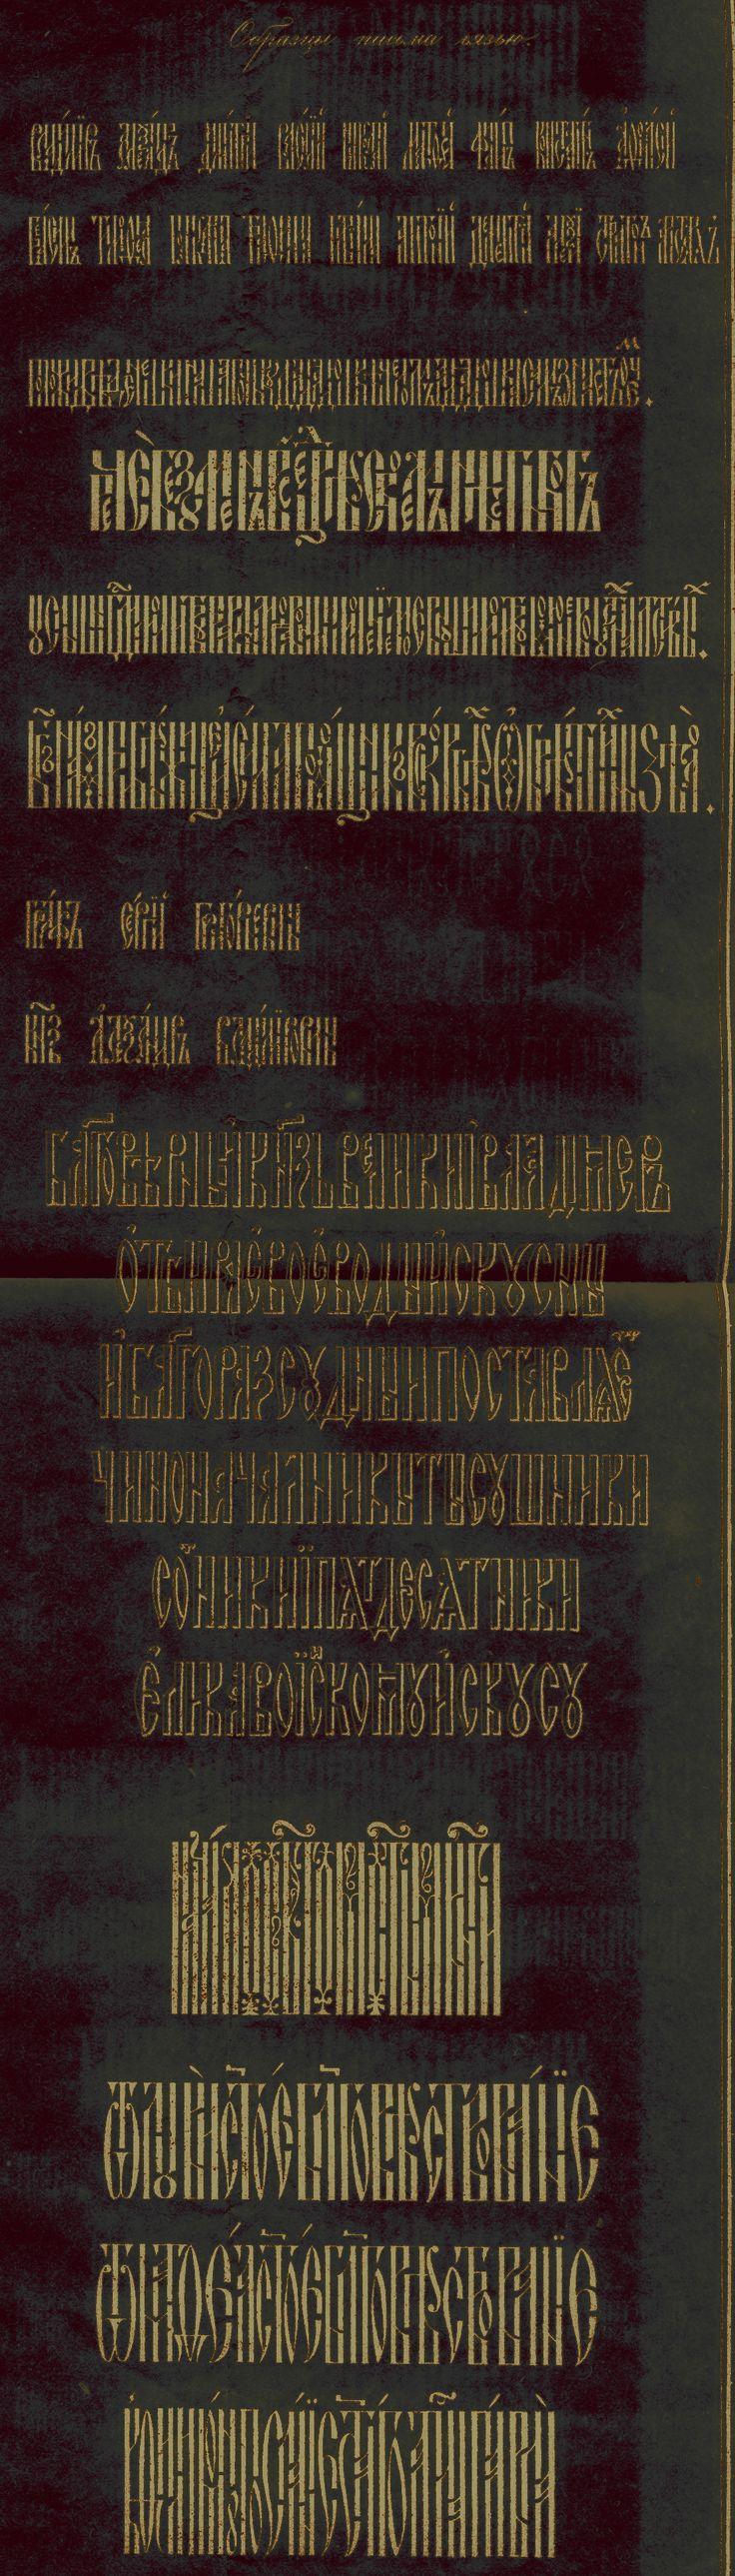 Образцы письма вязью. Vyaz